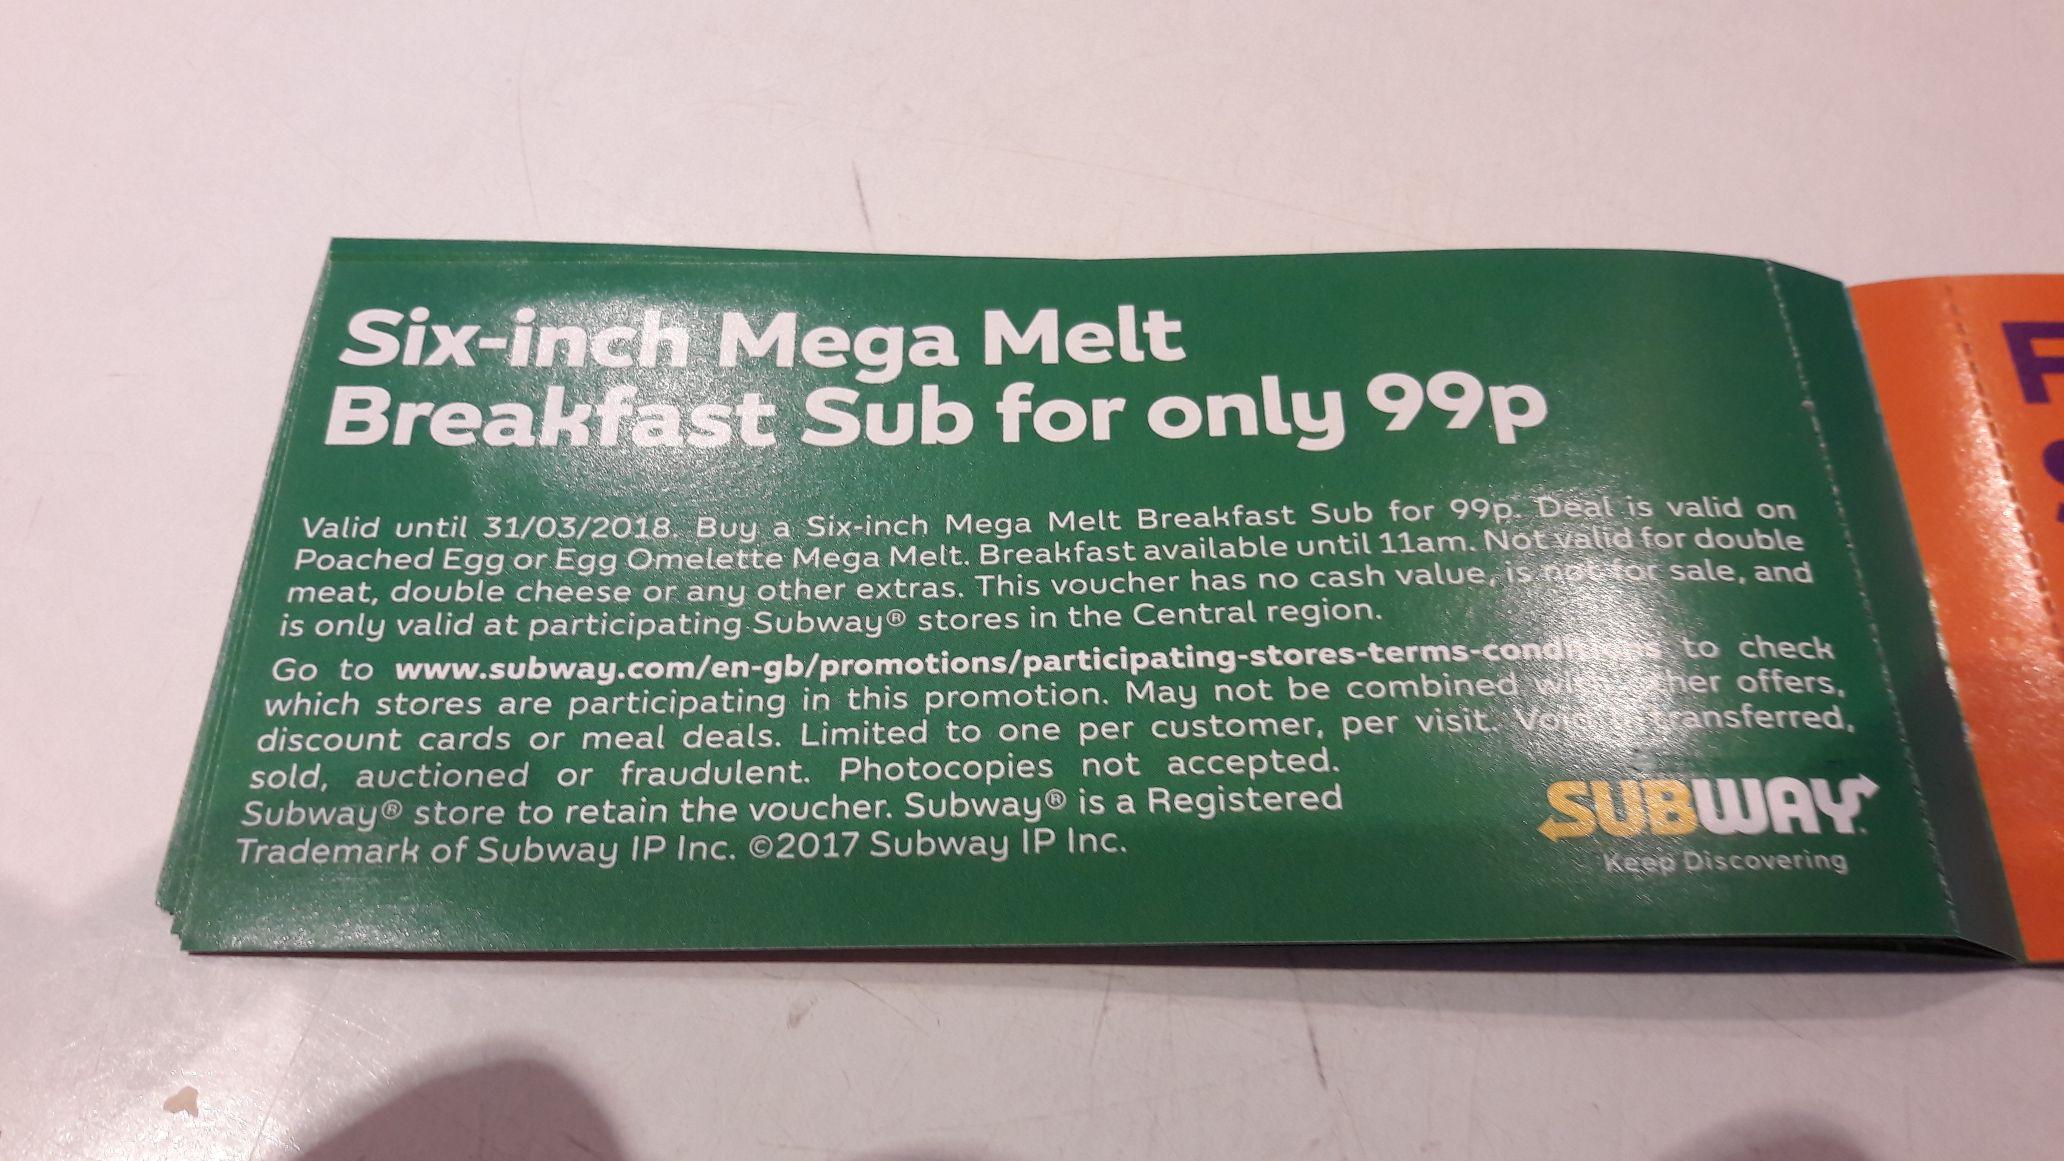 Six inch mega melt breakfast sub for just 99p @subway